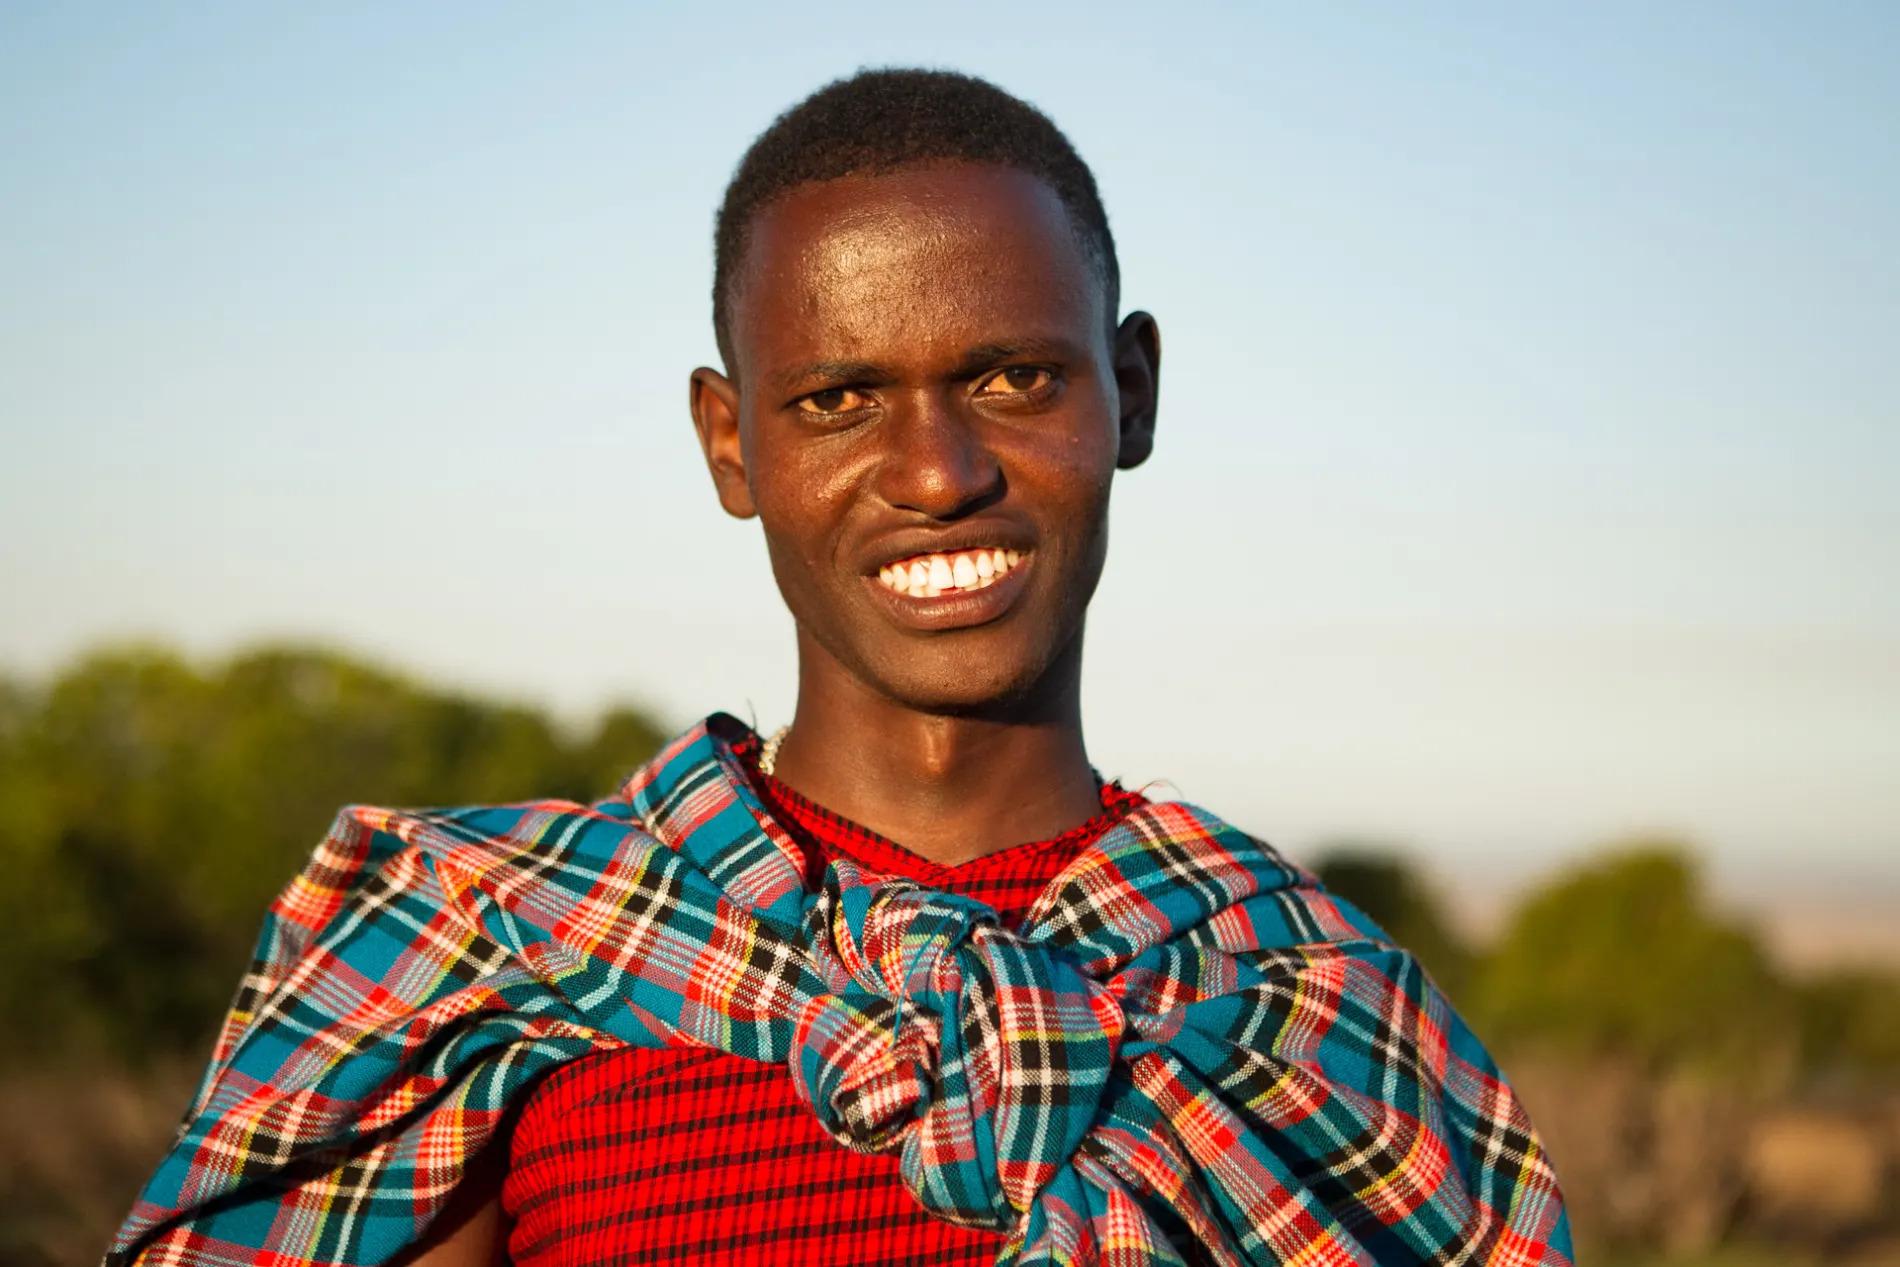 Maasai Man in red